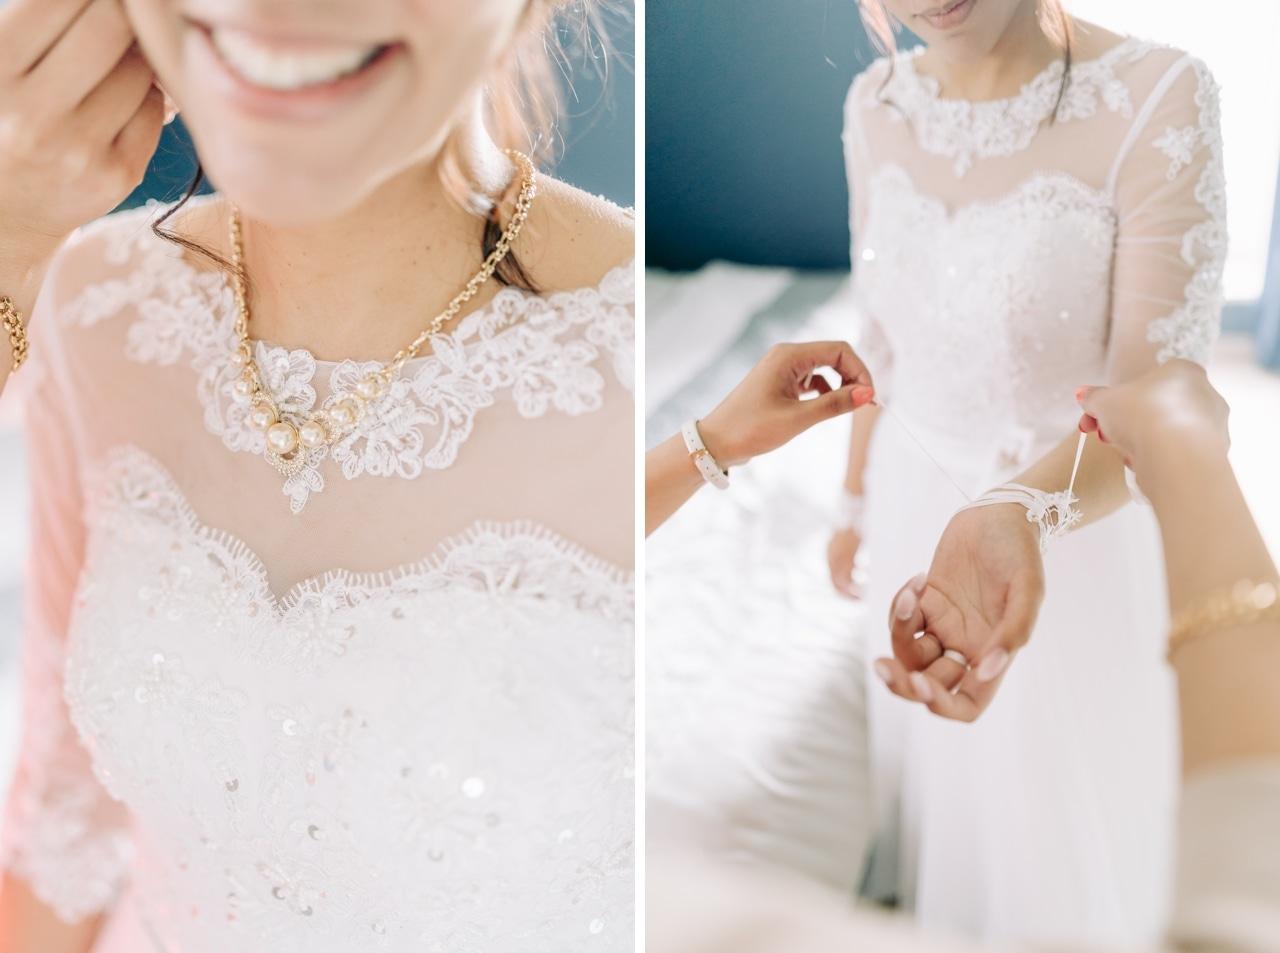 photographe-mariage-belgique-grand-champ-45